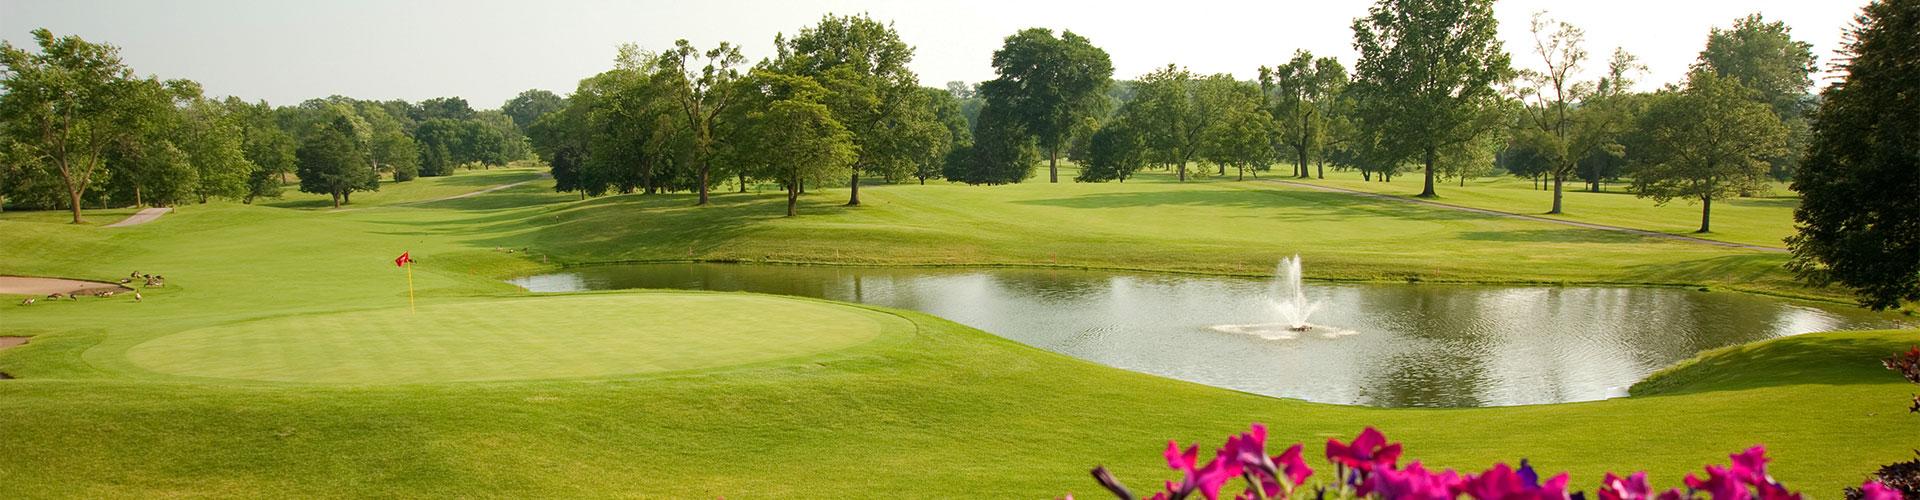 Orchard Ridge Country Club